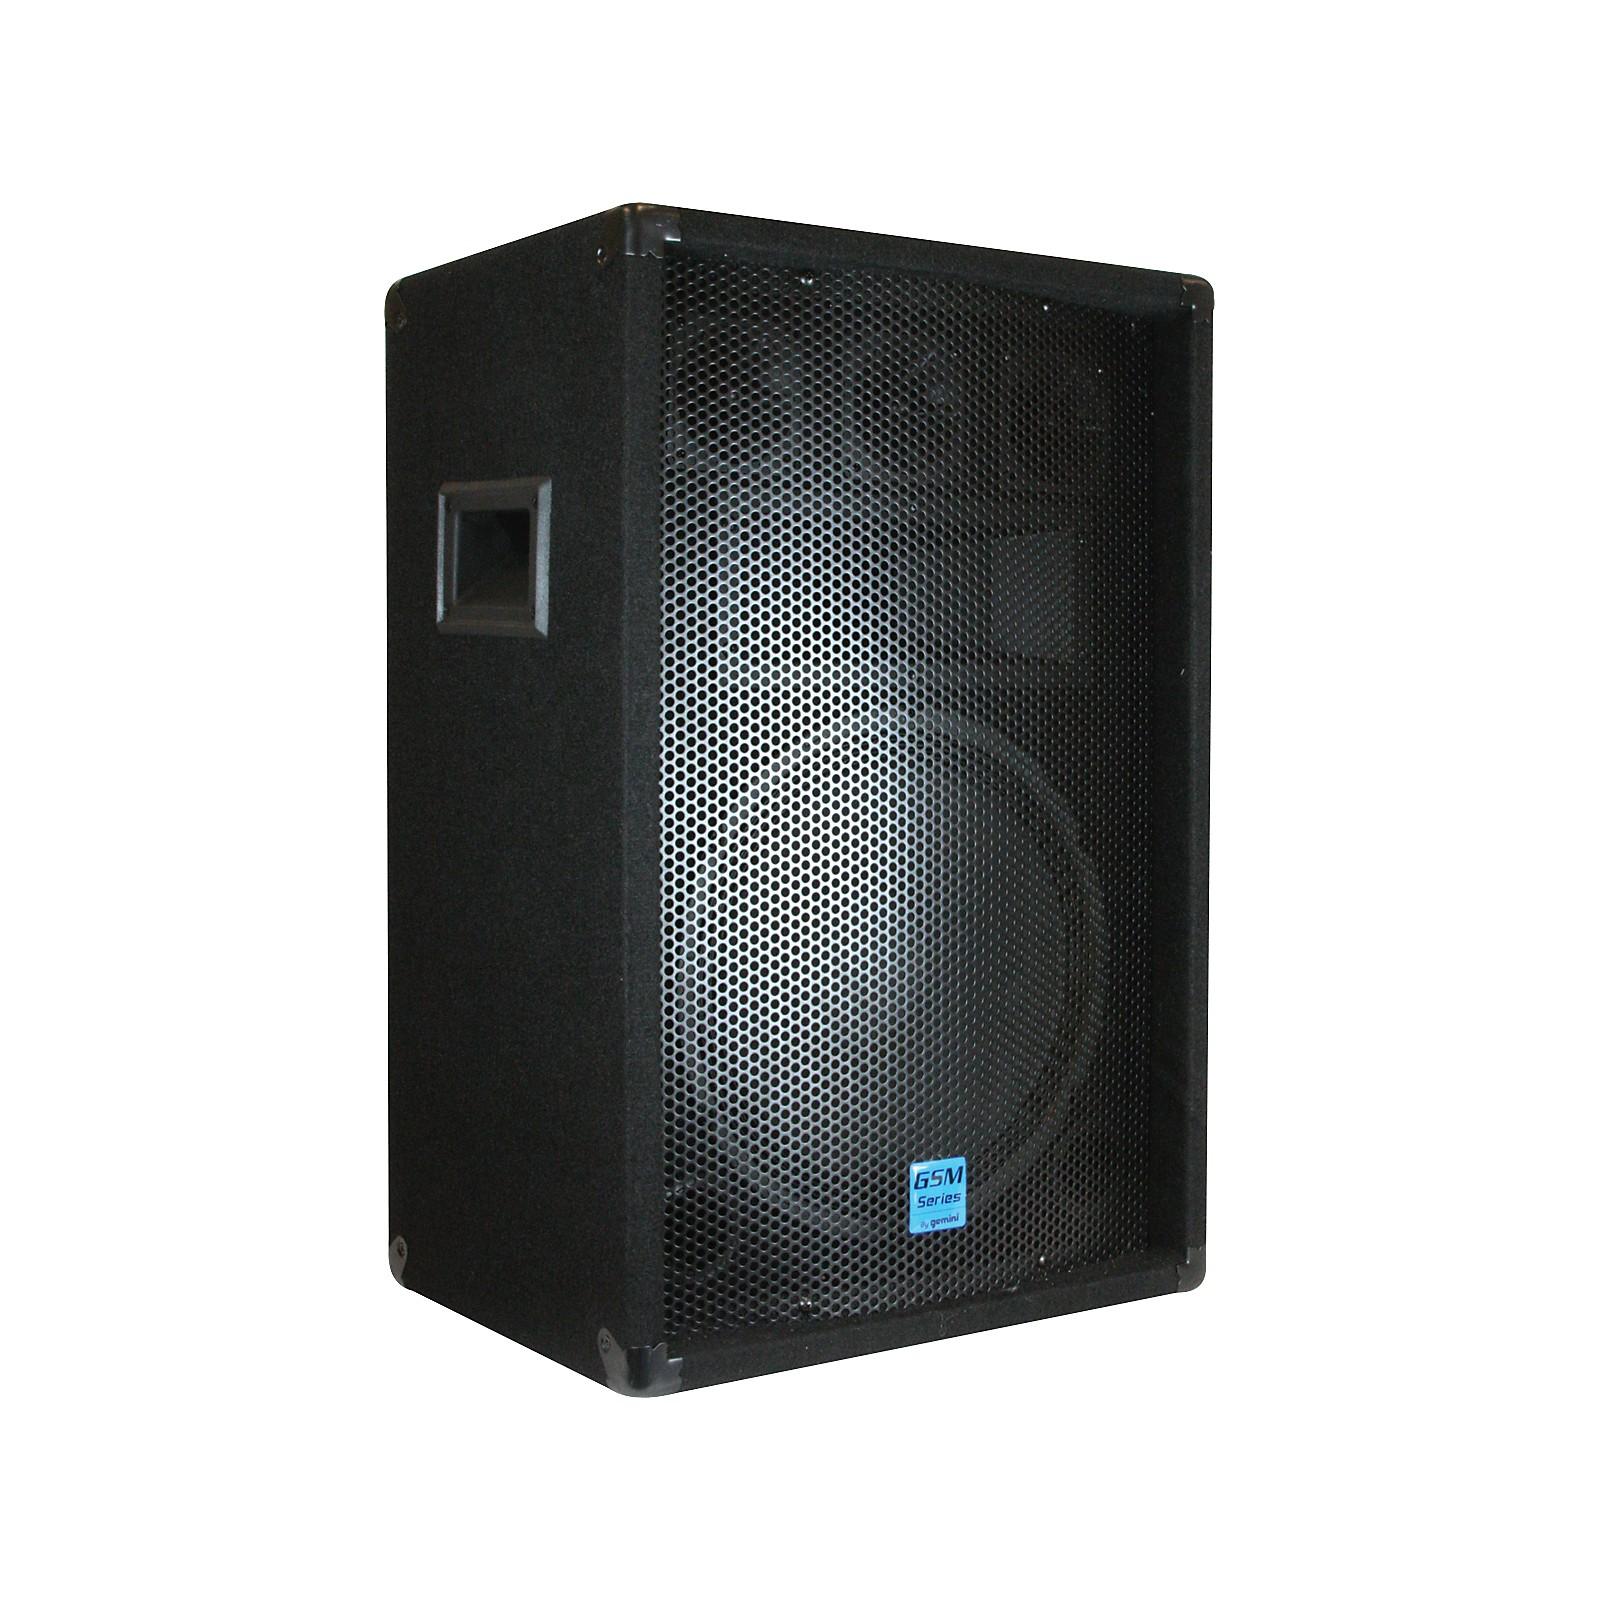 Open Box Gemini GSM-1260 12